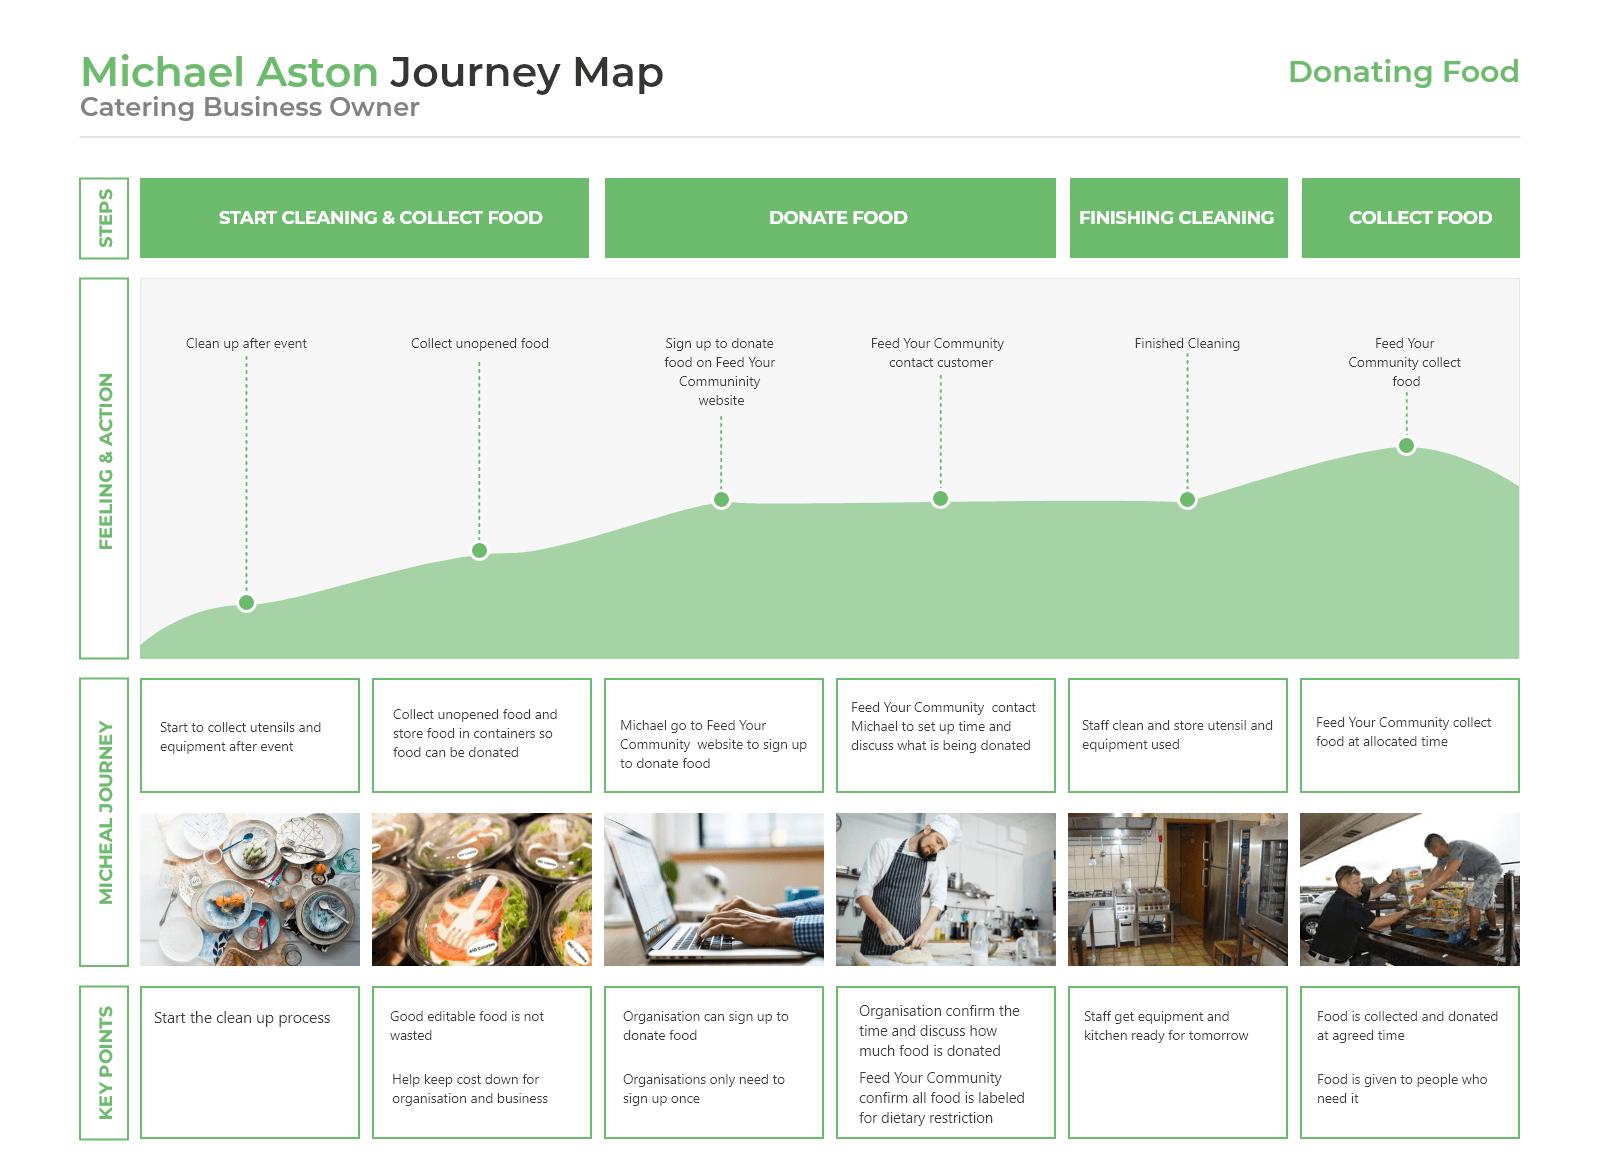 Michael Aston Journey Map